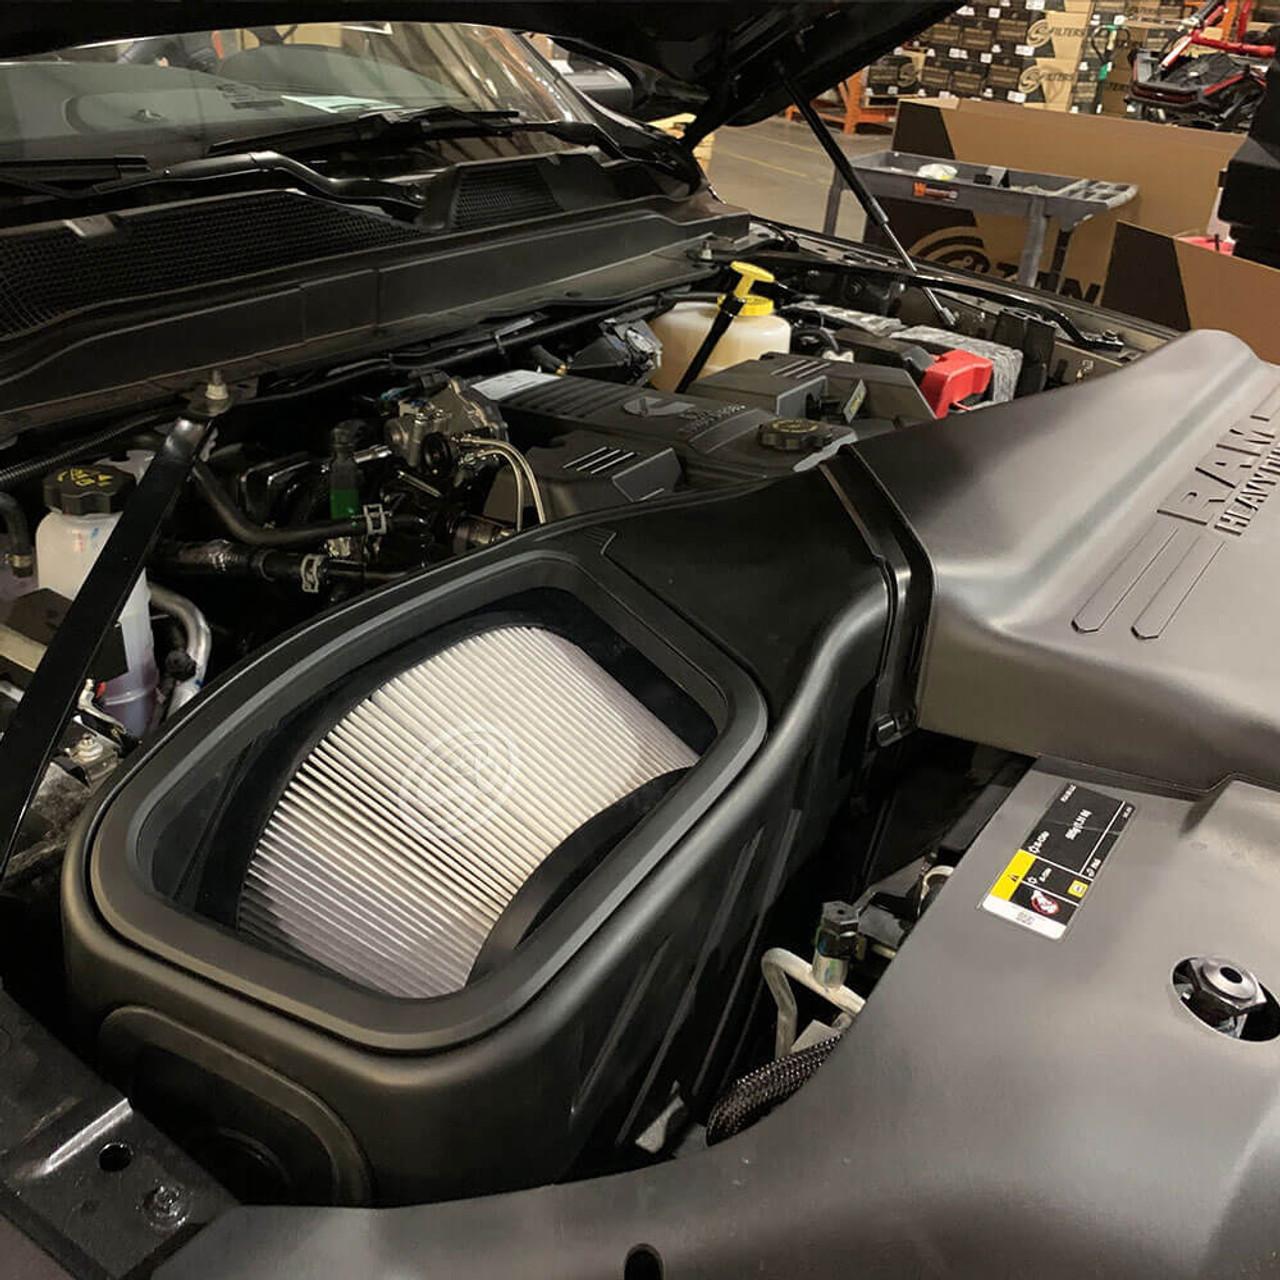 S&B 75-5132 Cold Air Intake For 19-20 Dodge Ram Cummins 6.7L